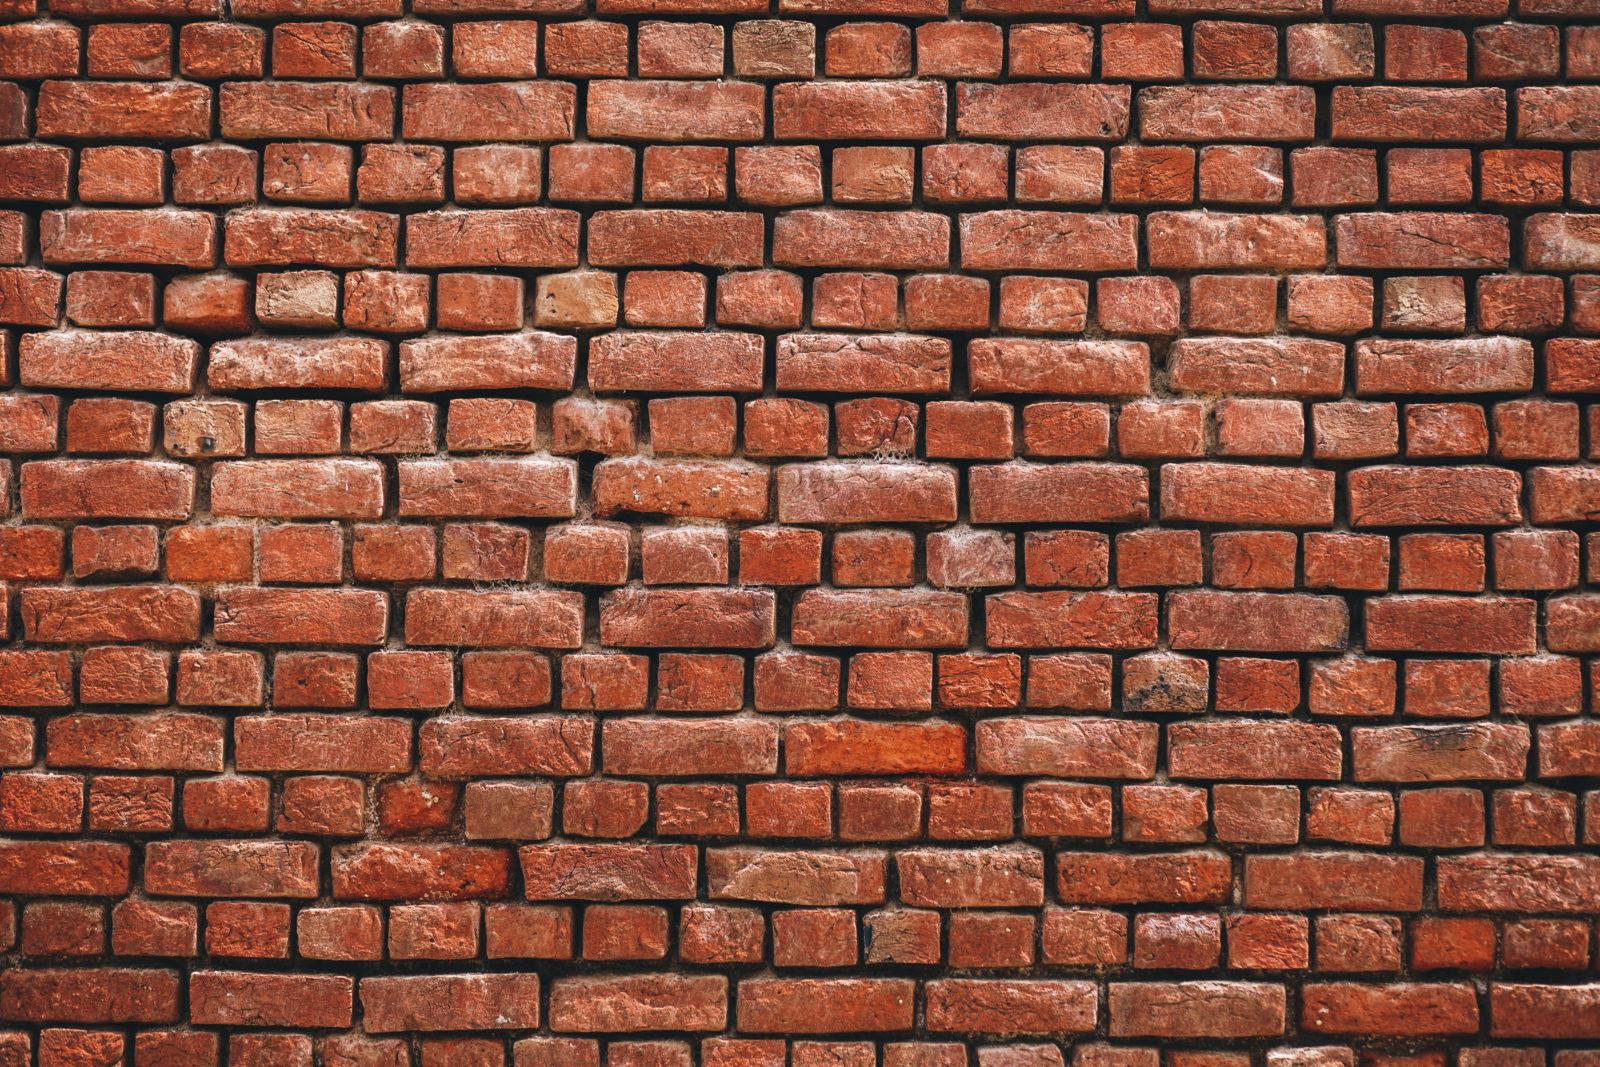 GlusterFS fix faulty bricks